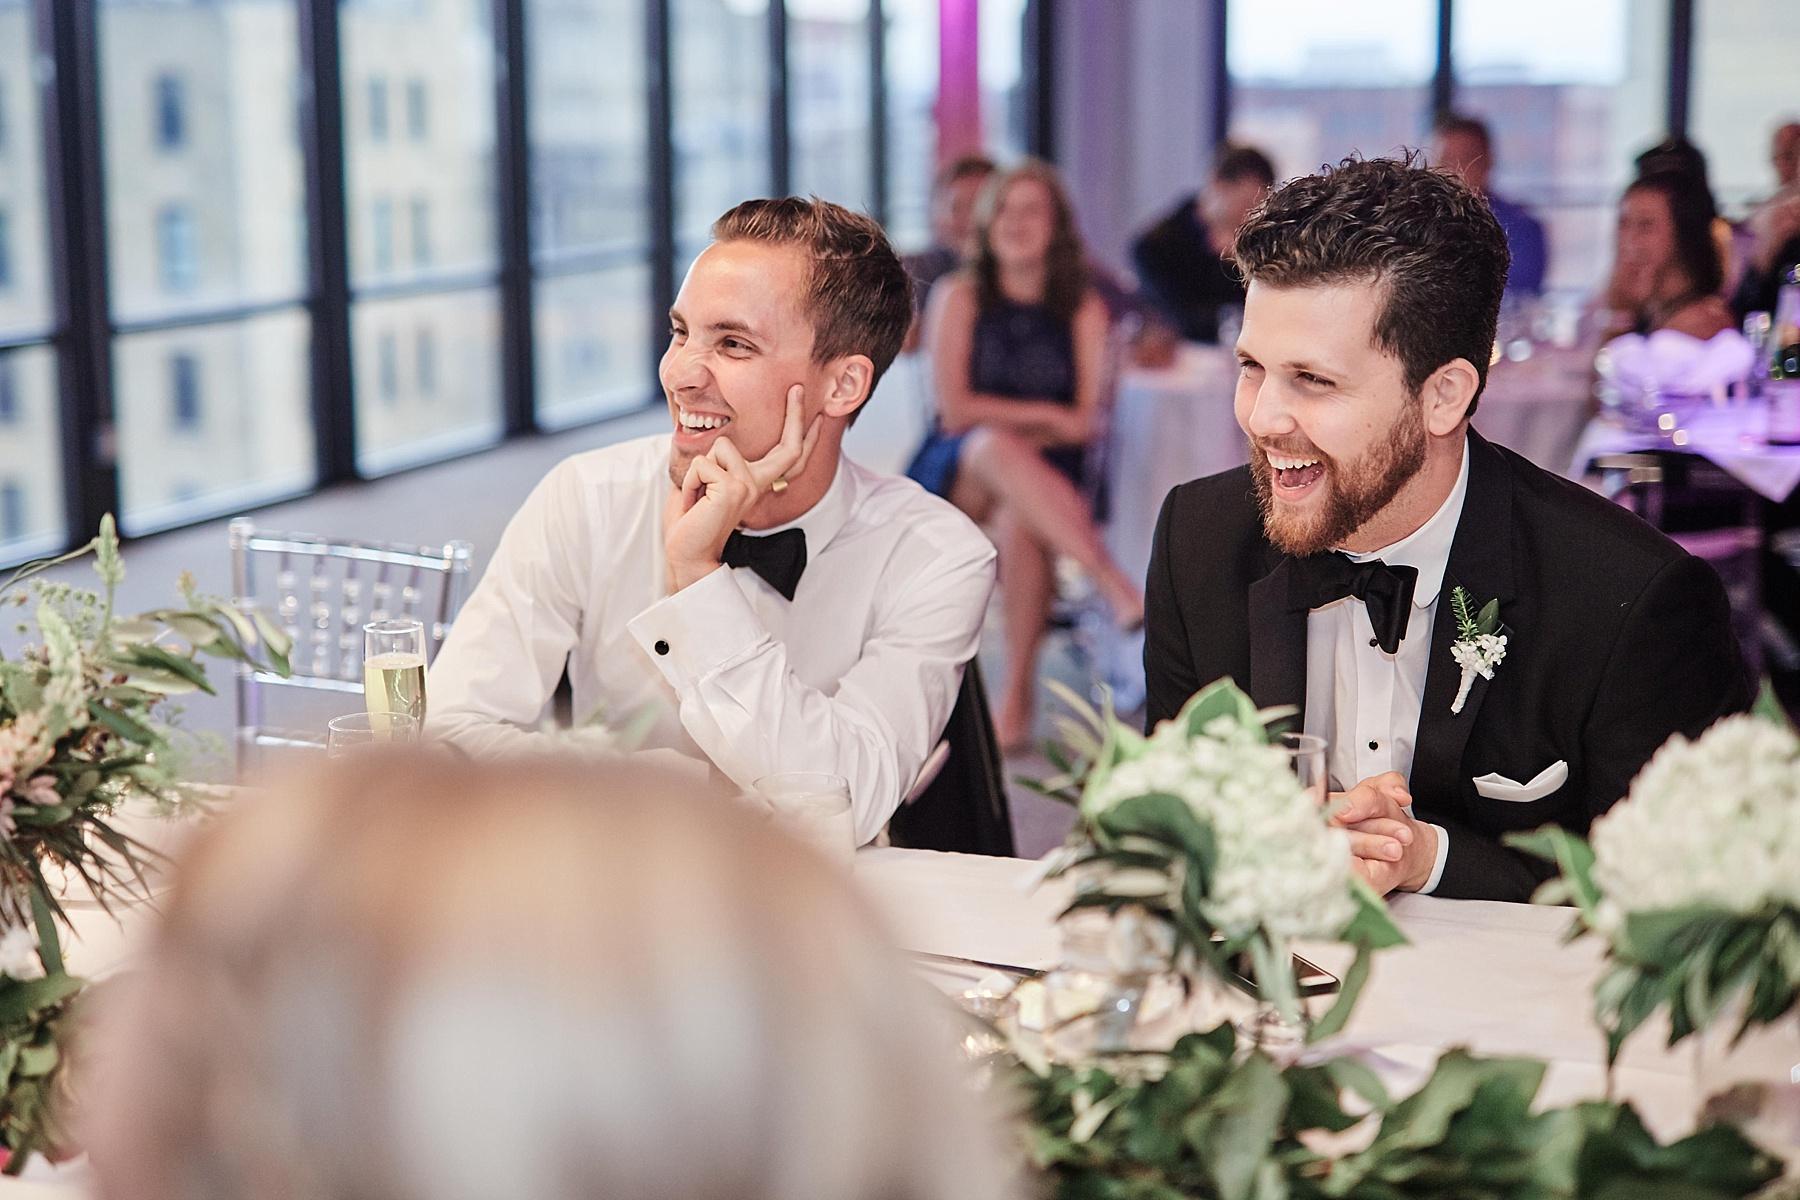 ABULAE-Wedding-Saint-paul-MN-Josh-Sofia-Wedding-Mears-Park_0830.jpg